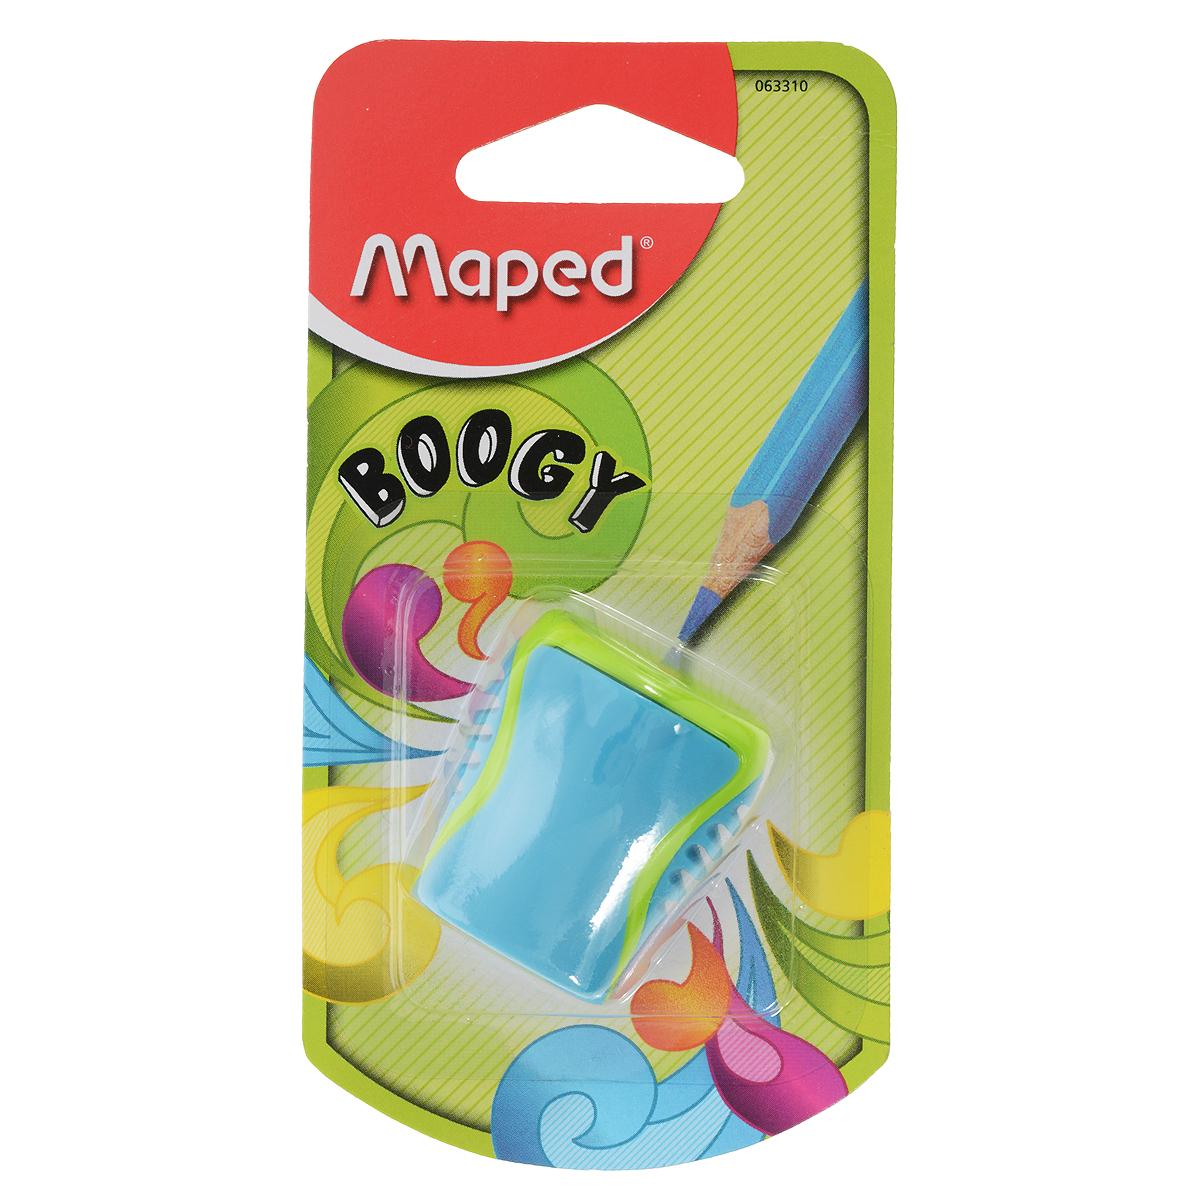 Точилка Maped Boogy, с контейнером, цвет: голубой maped точилка eject clic цвет бирюзовый